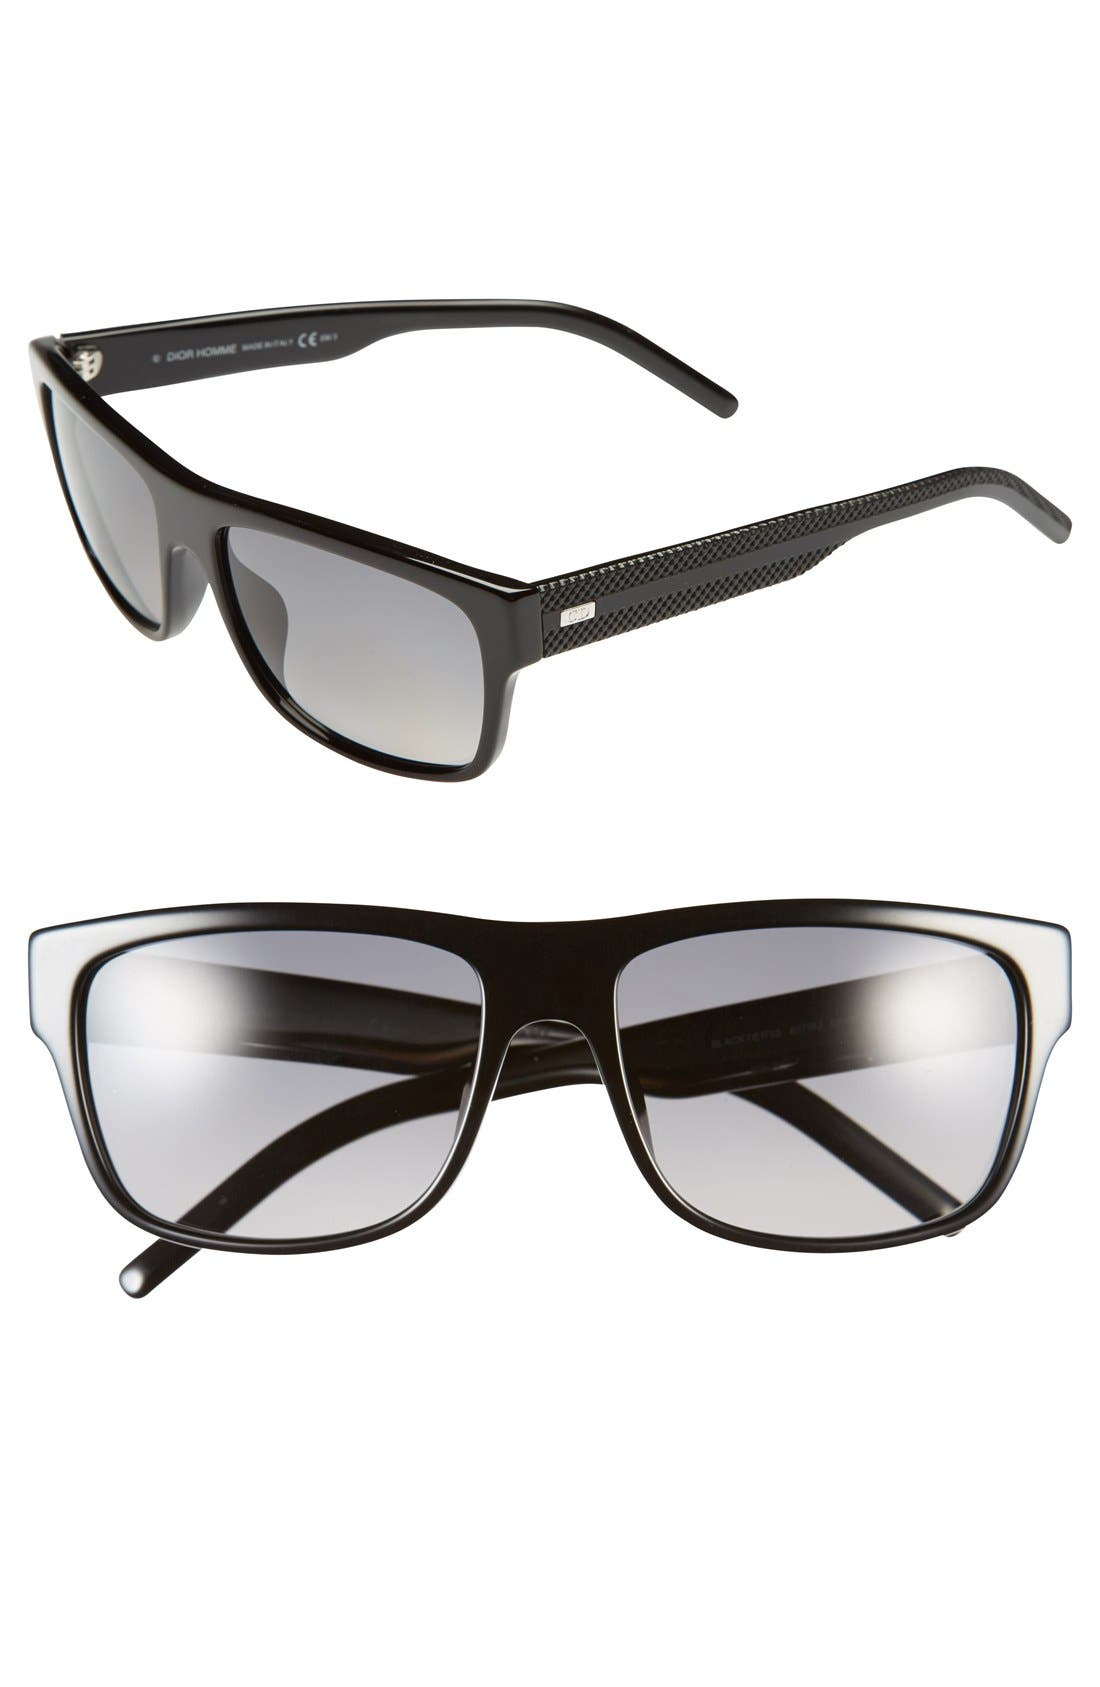 Main Image - Dior Homme 57mm Polarized Sunglasses